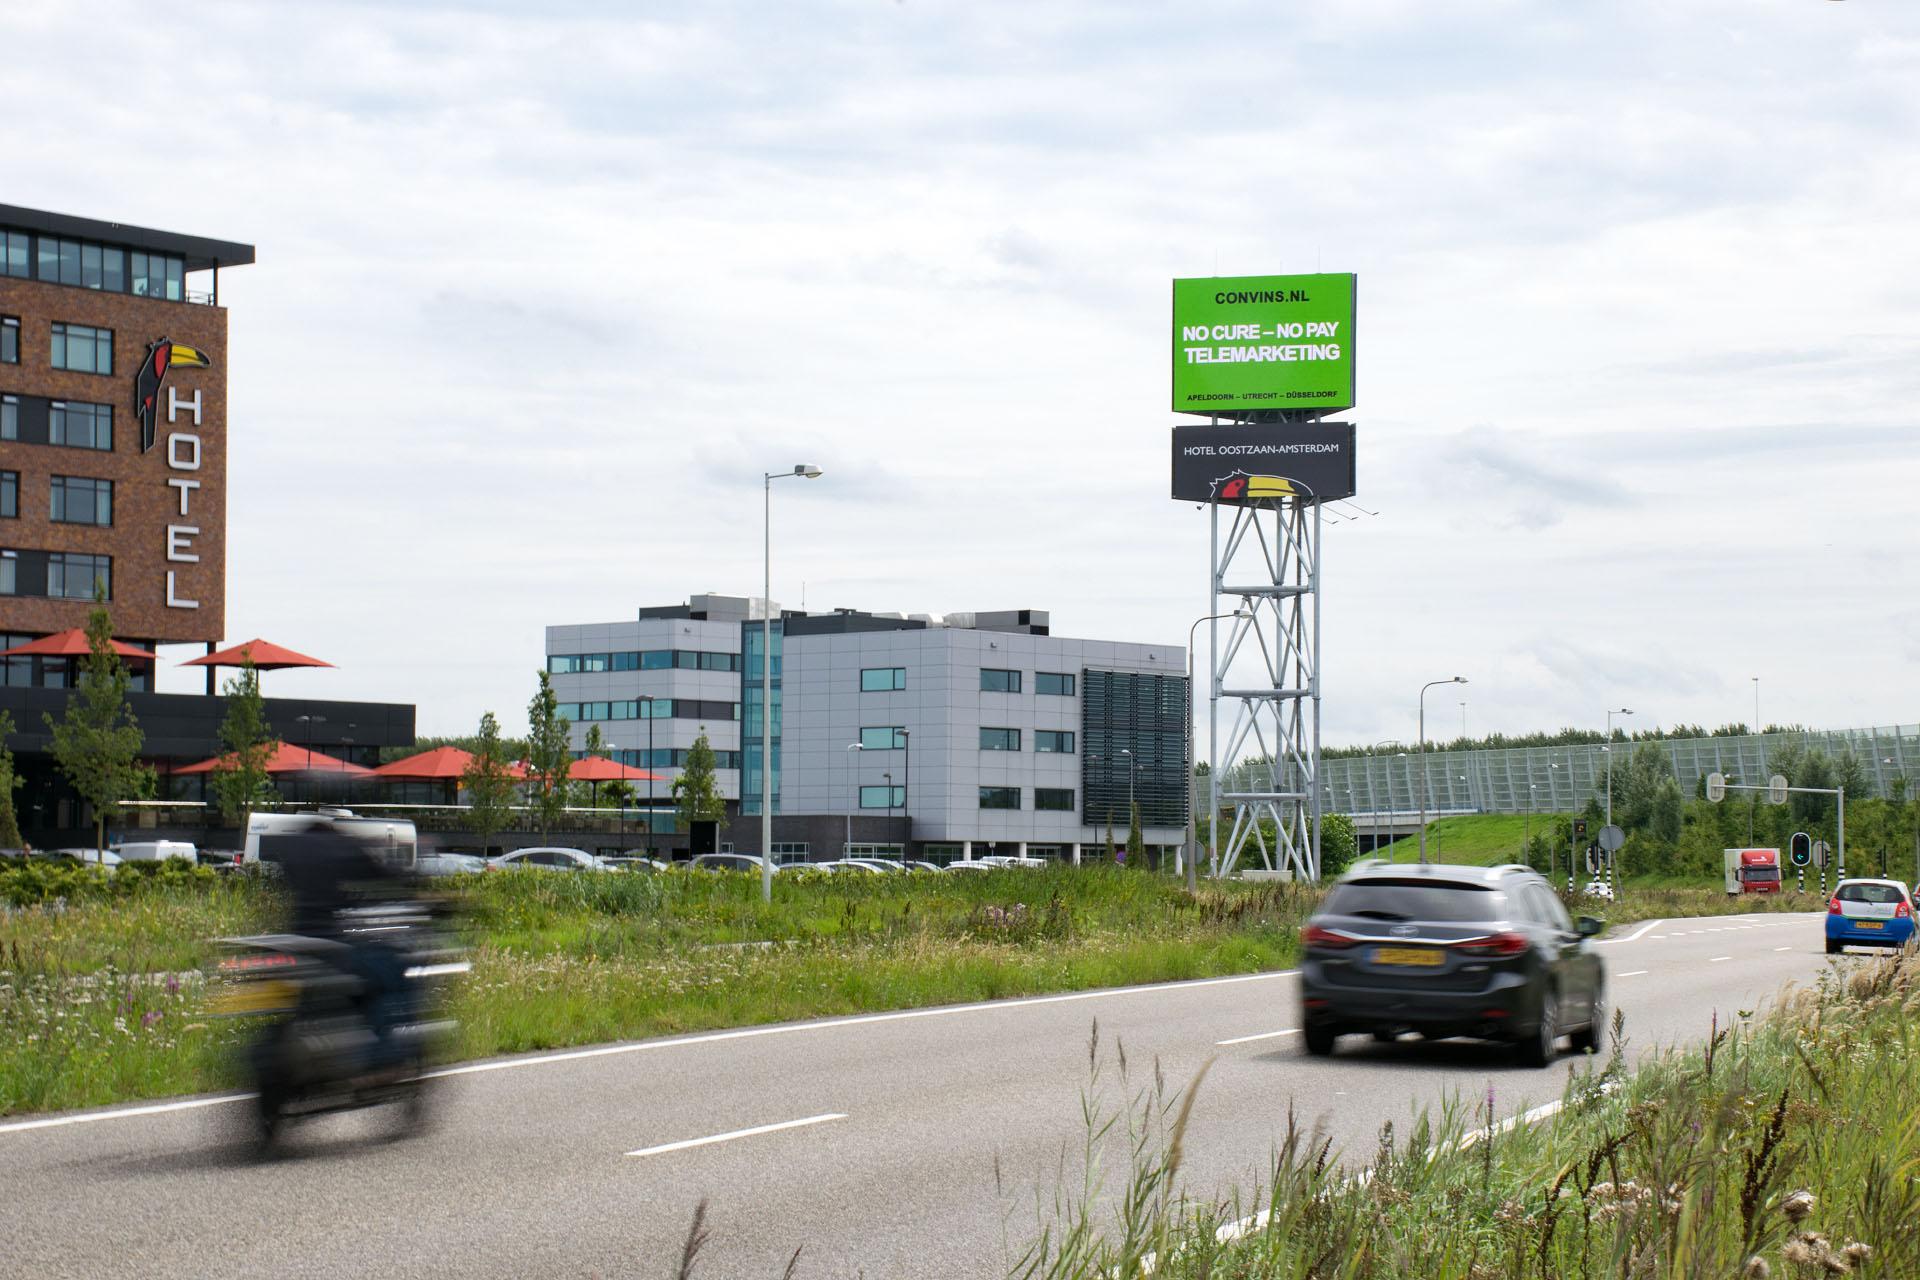 Van der Valk Hotel Oostzaan-Amsterdam